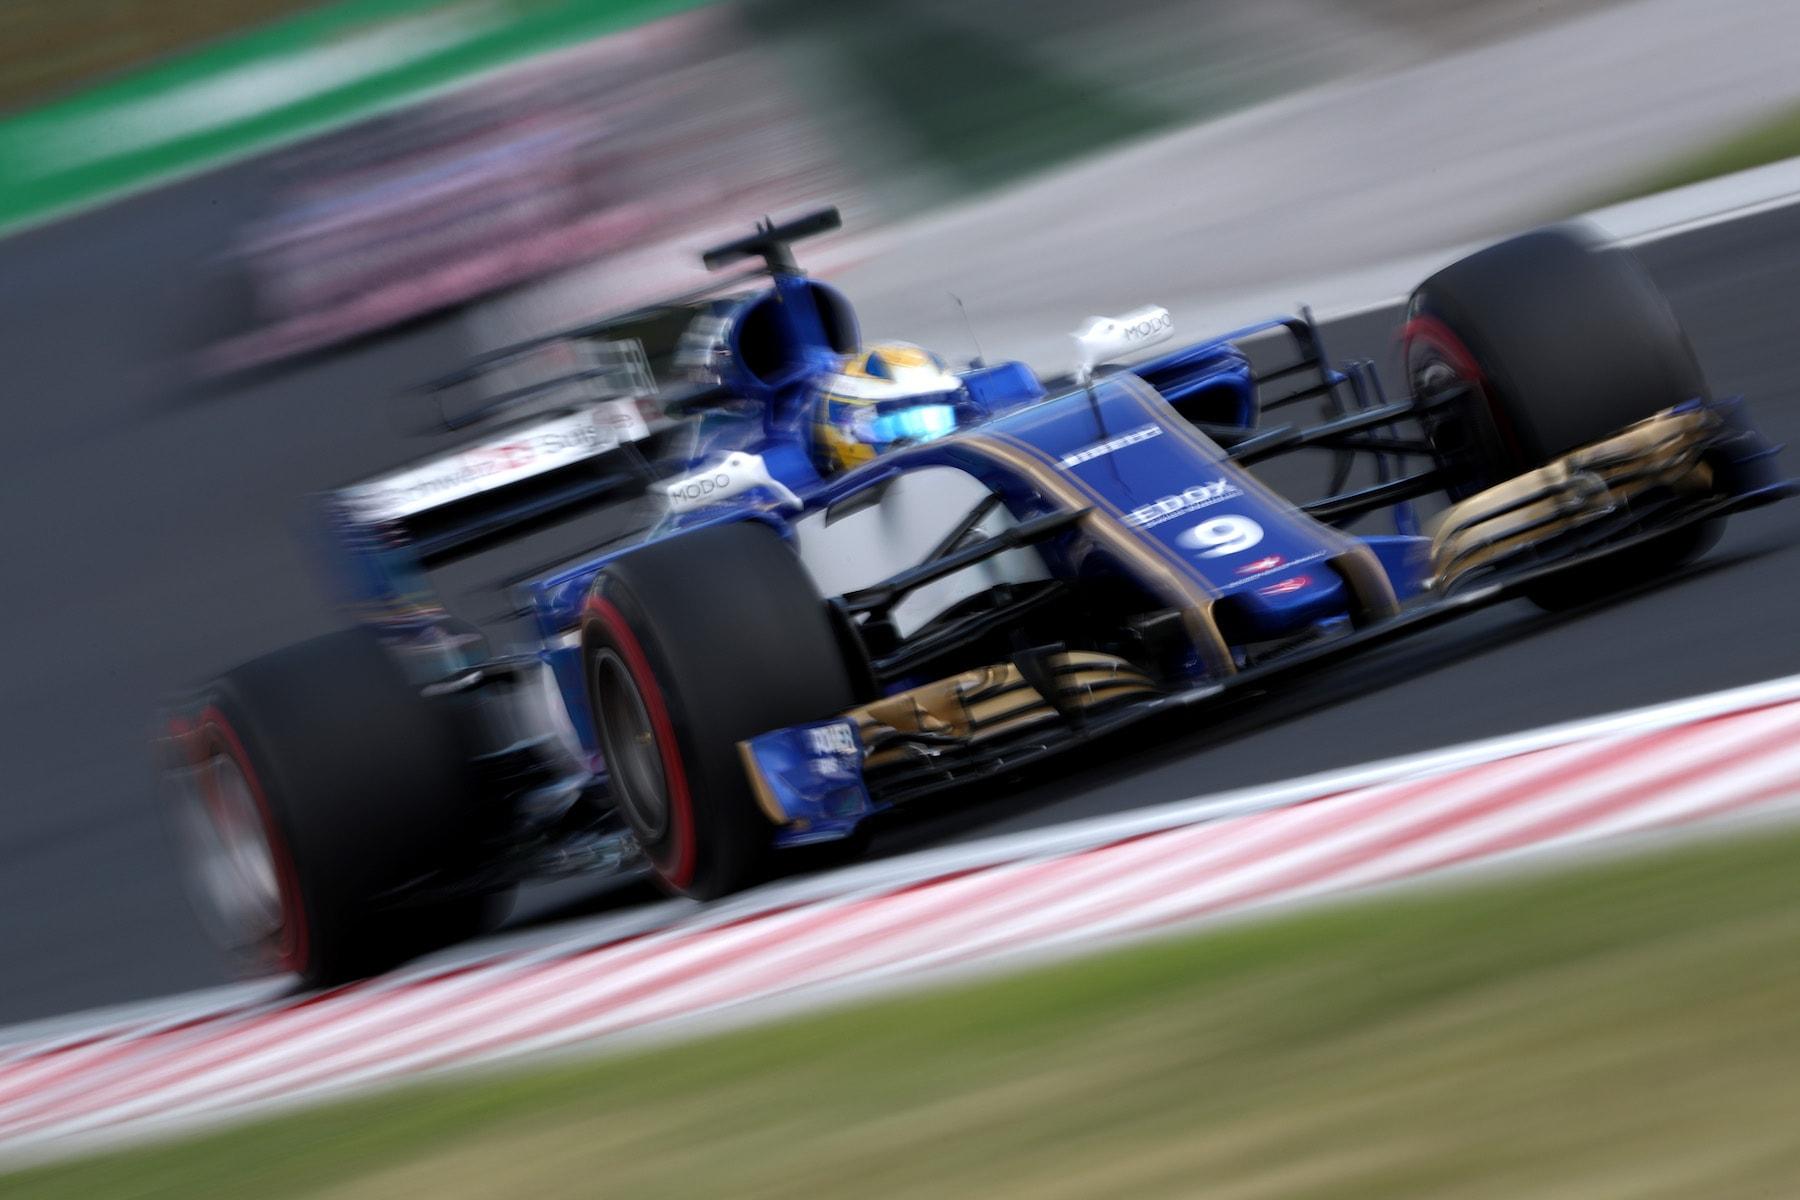 2017 Marcus Ericsson | Sauber C36 | 2017 Hungarian GP FP2 1 copy.jpg